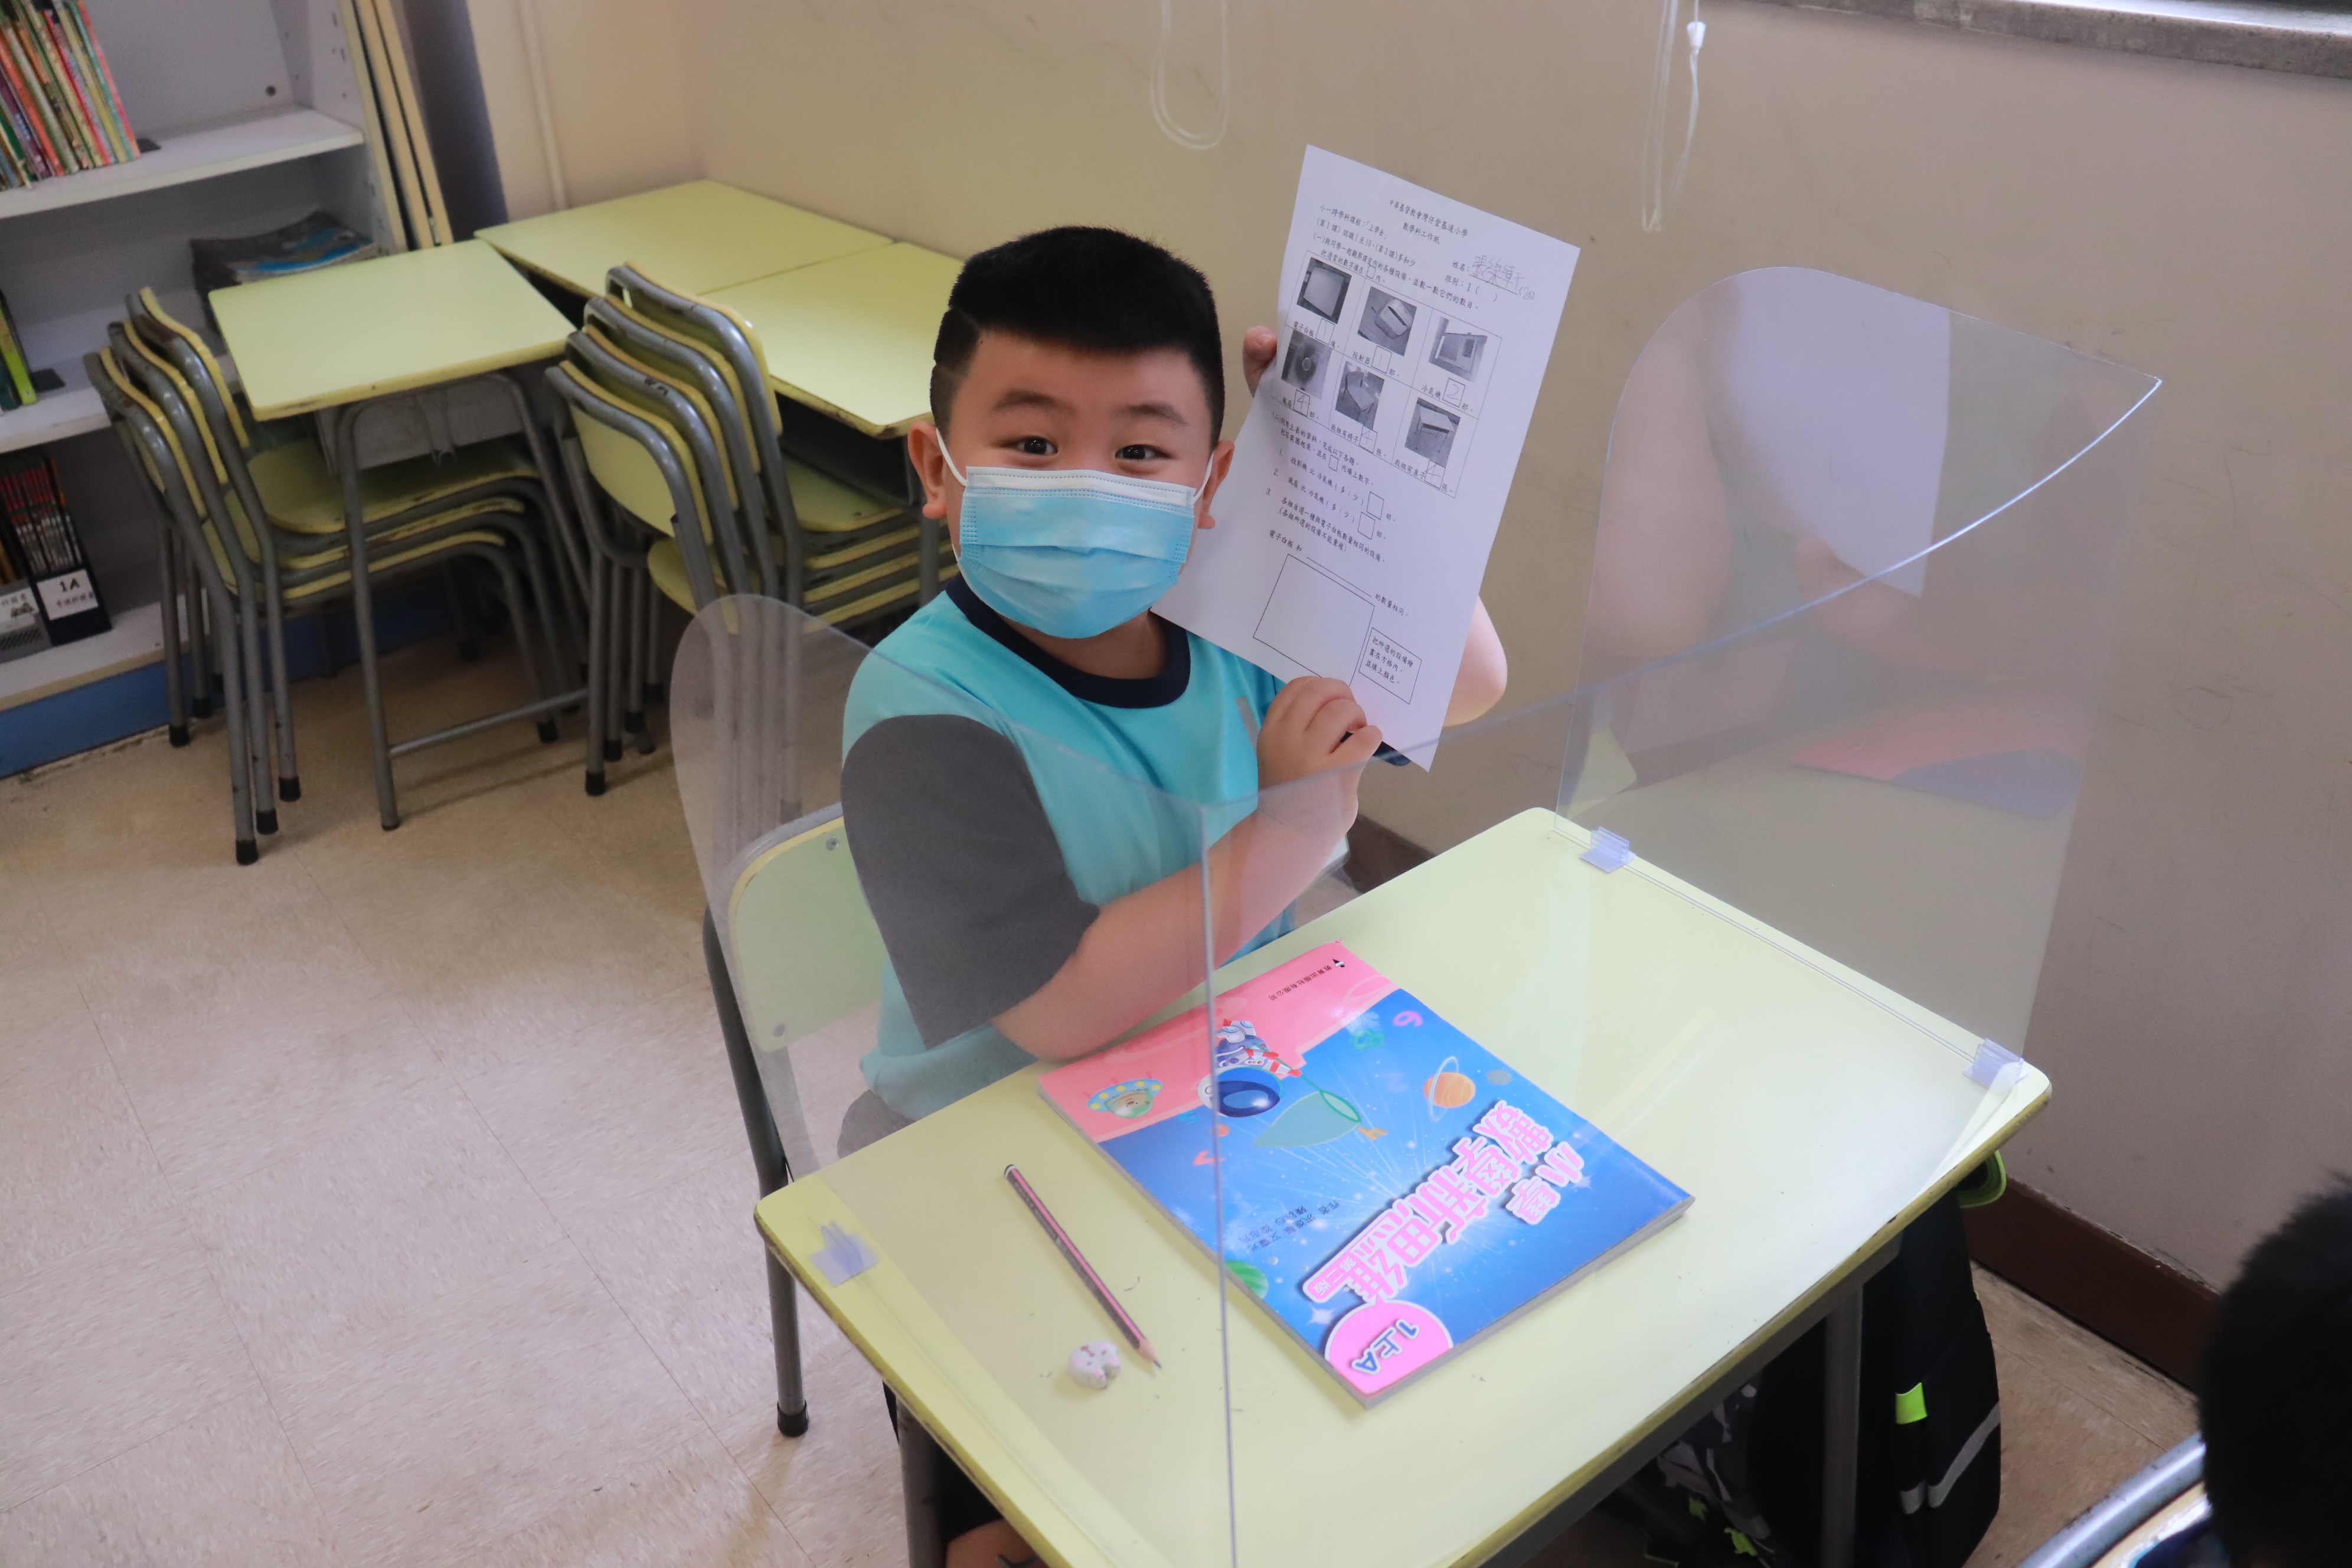 http://keito.school.hk/sites/default/files/img_6179.jpg